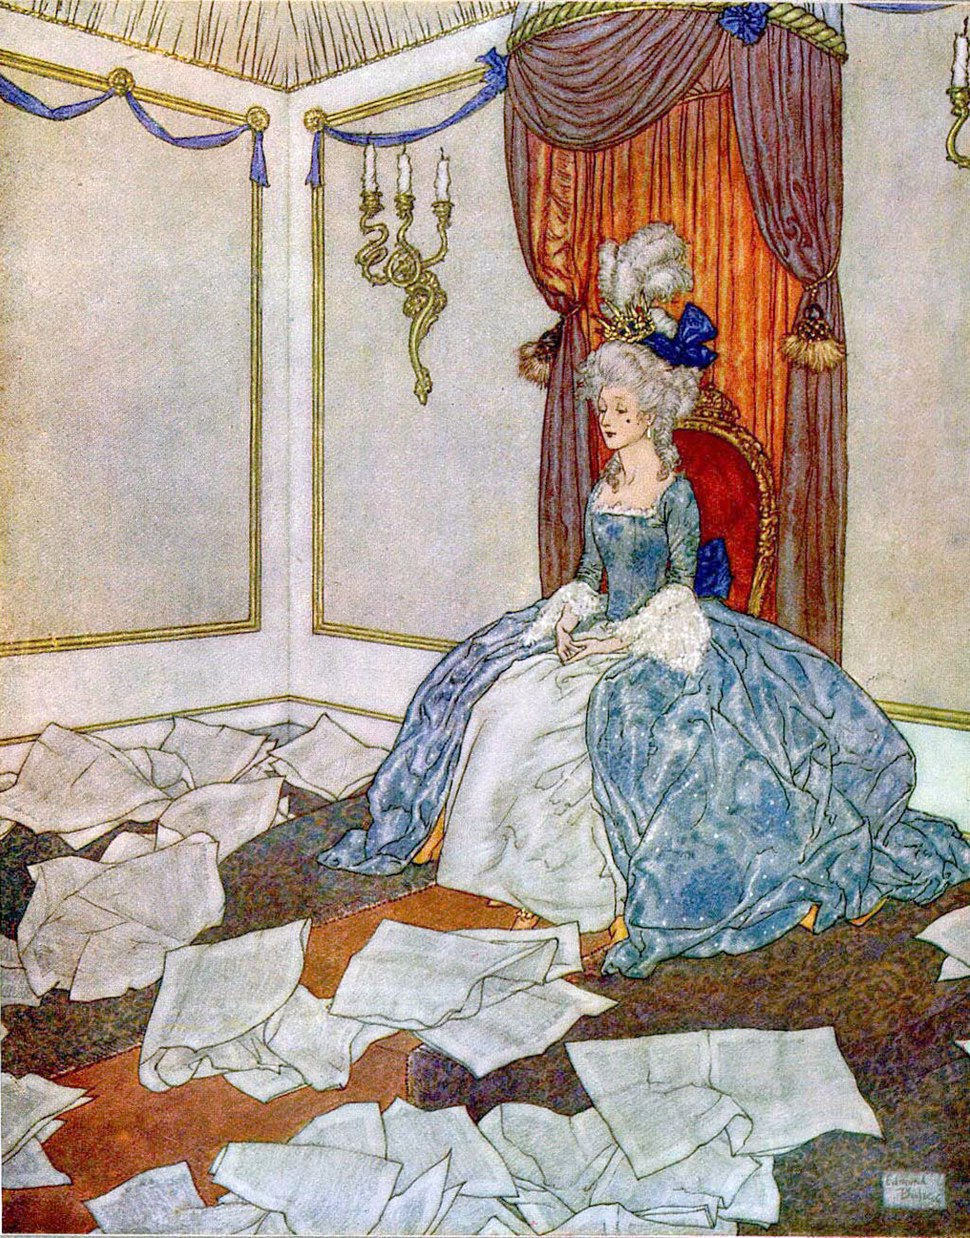 Edmund Dulac - Prince and Princess